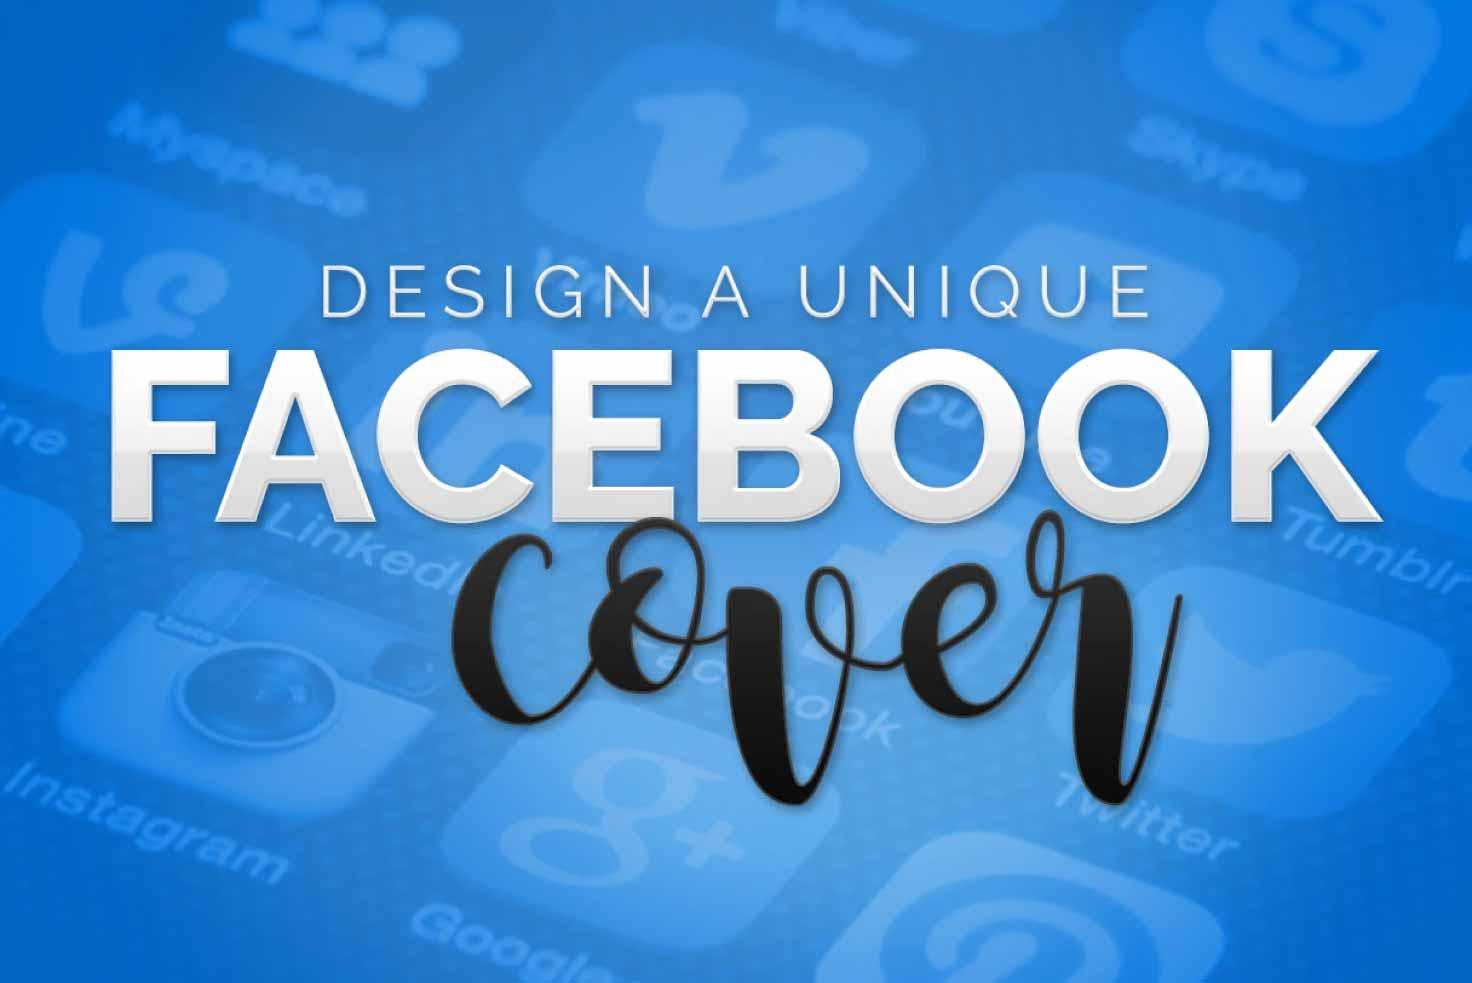 I will design a unique Facebook cover